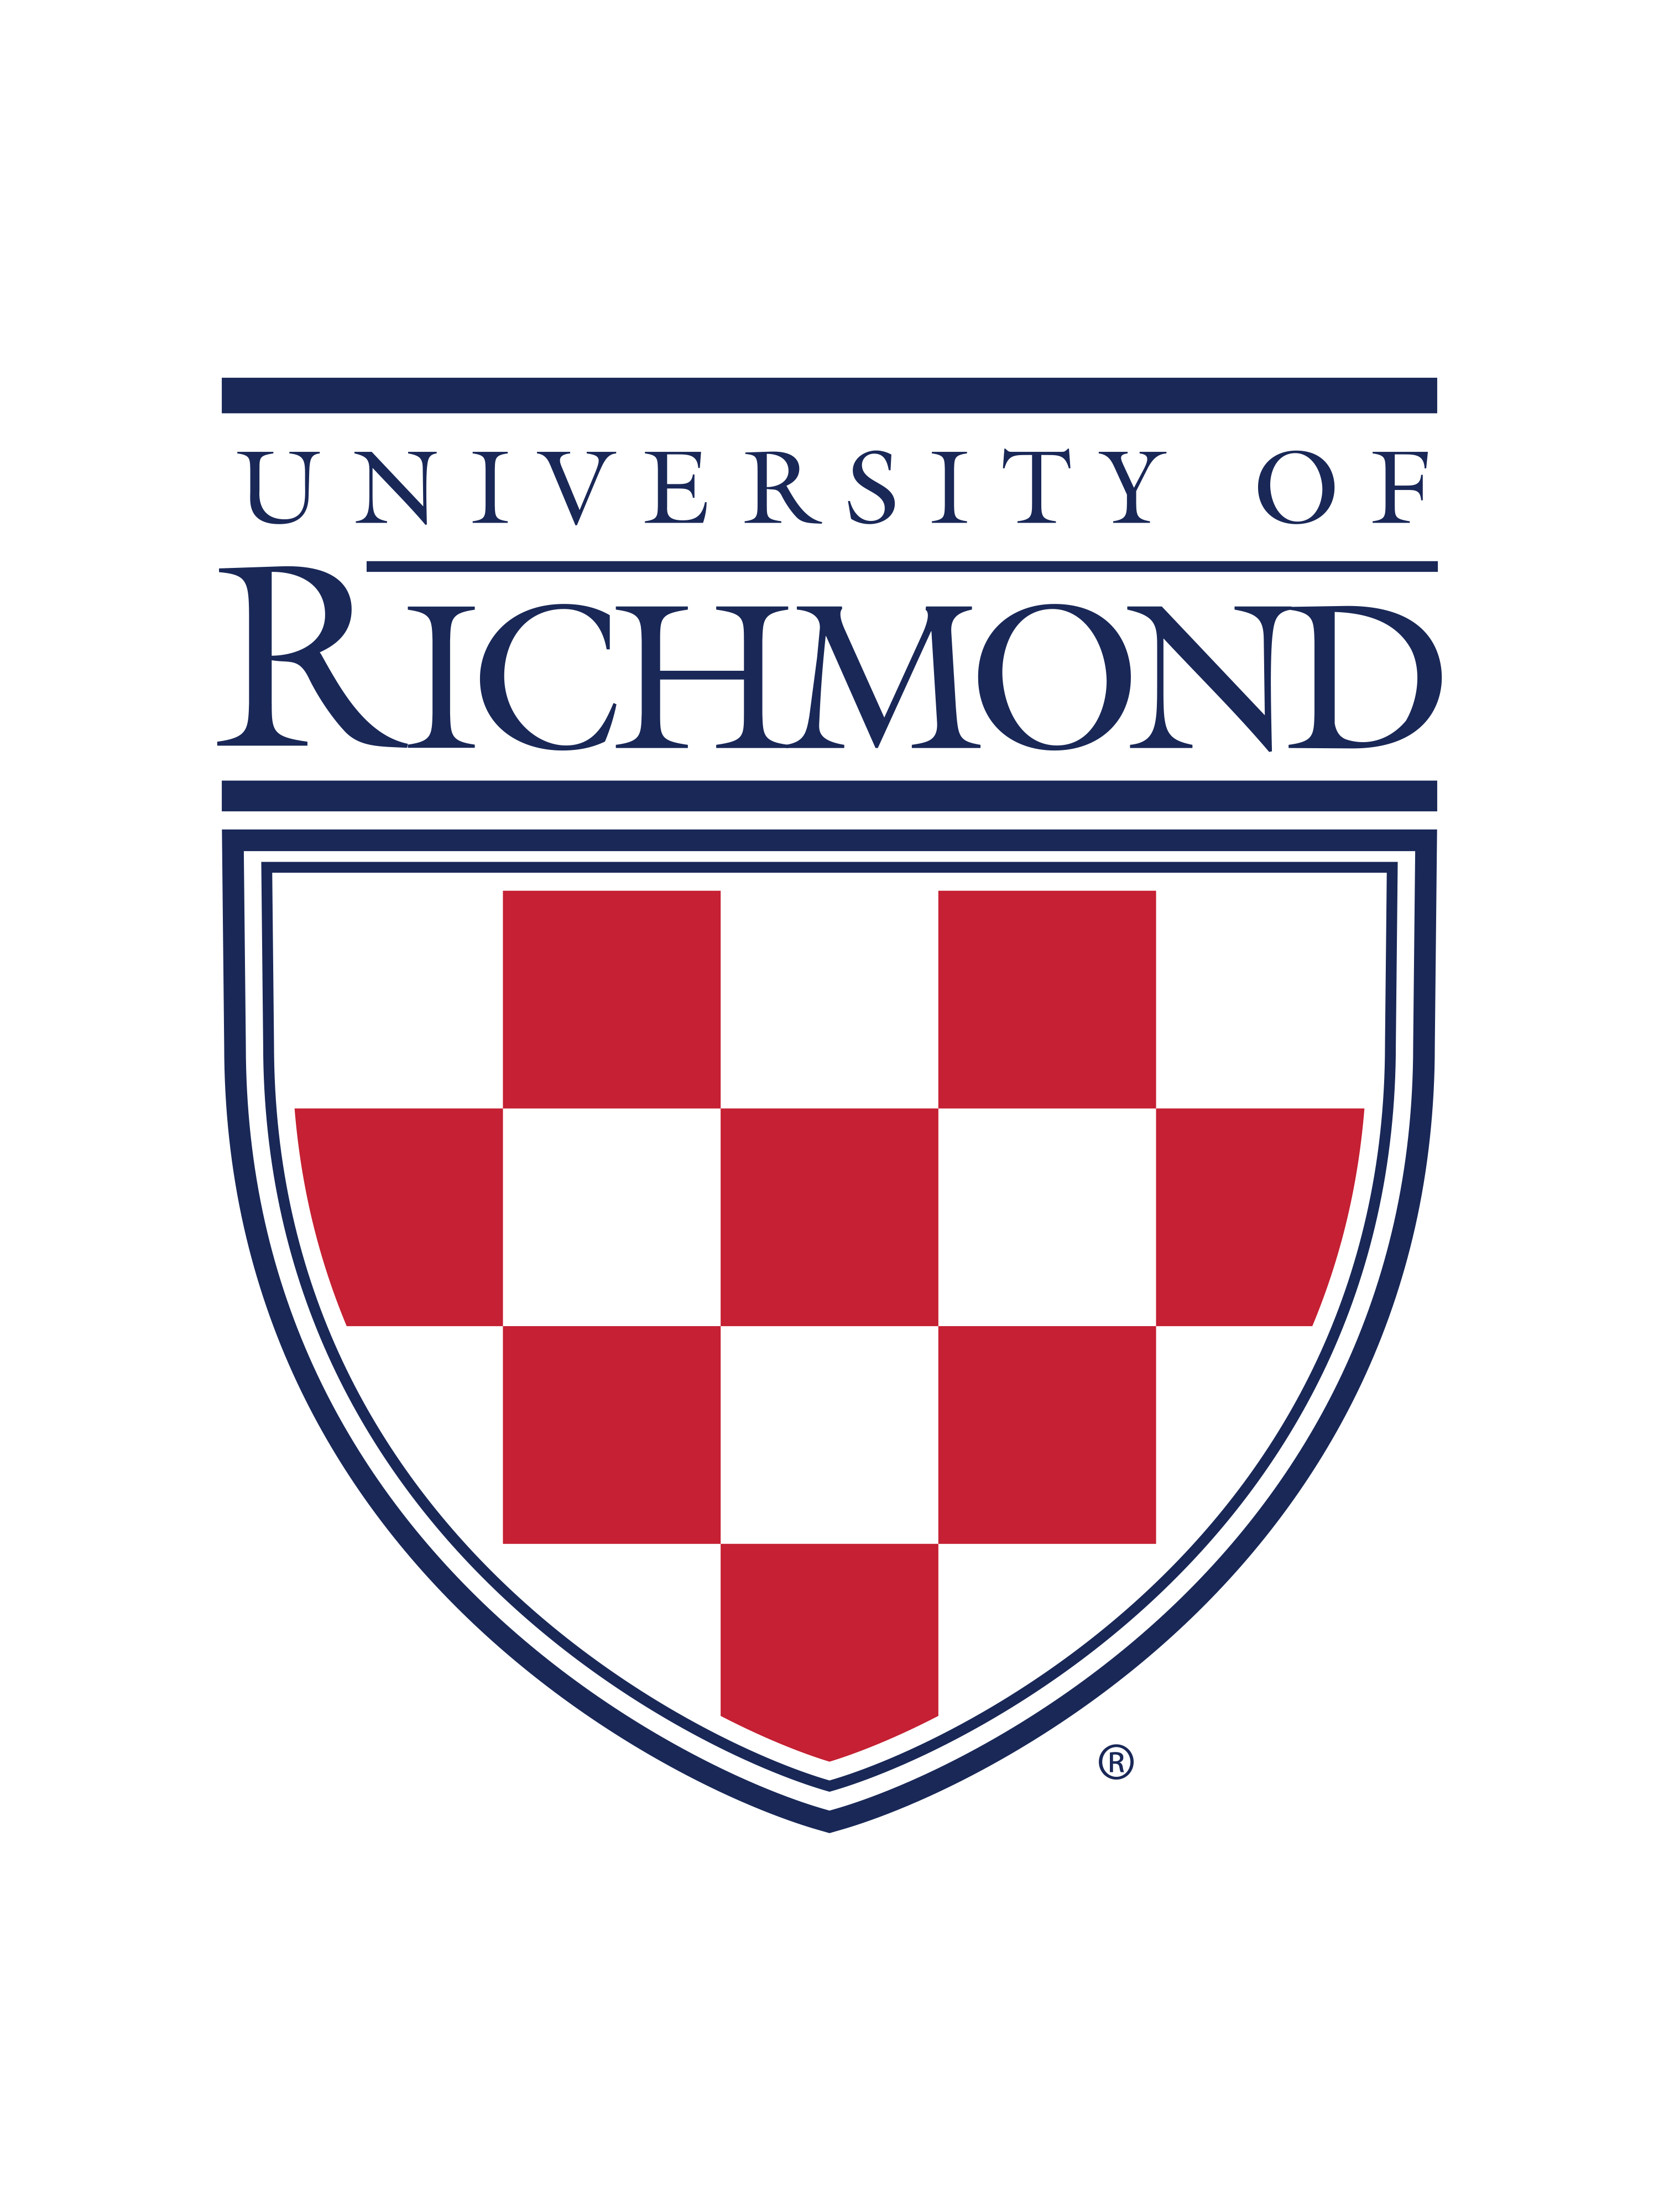 Richmond Shield